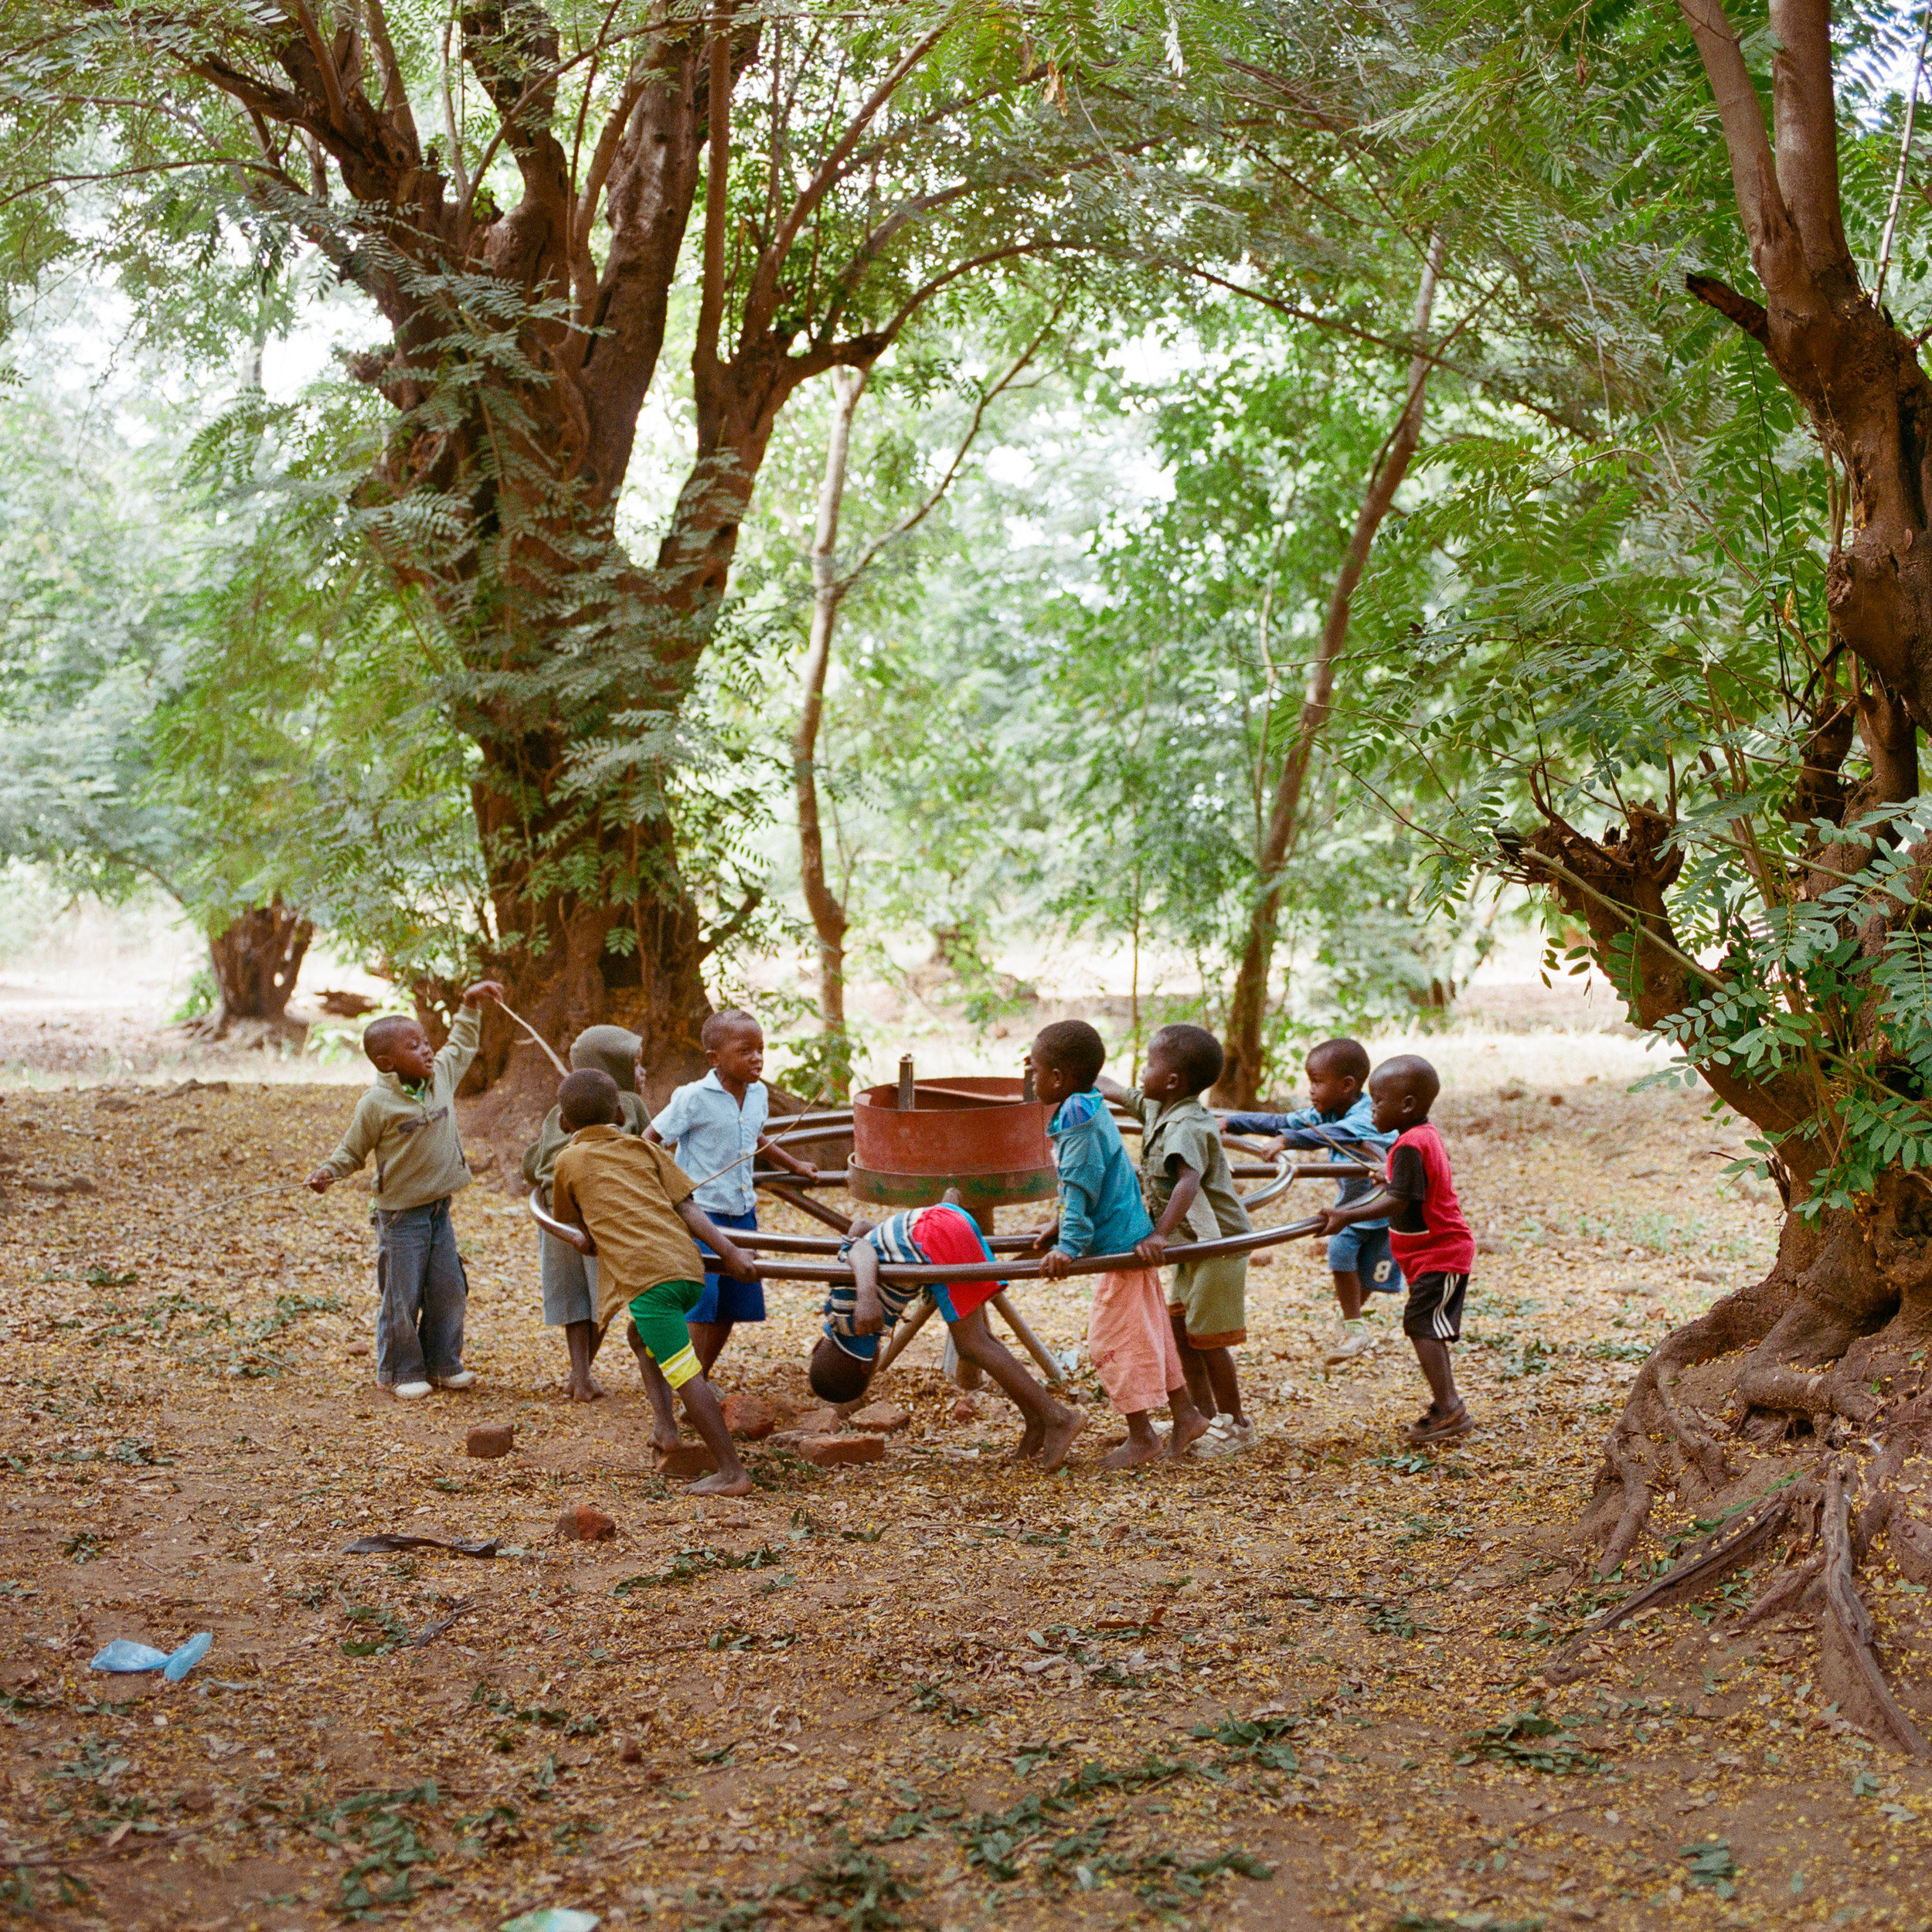 Malawi_PlayPump_003.jpg